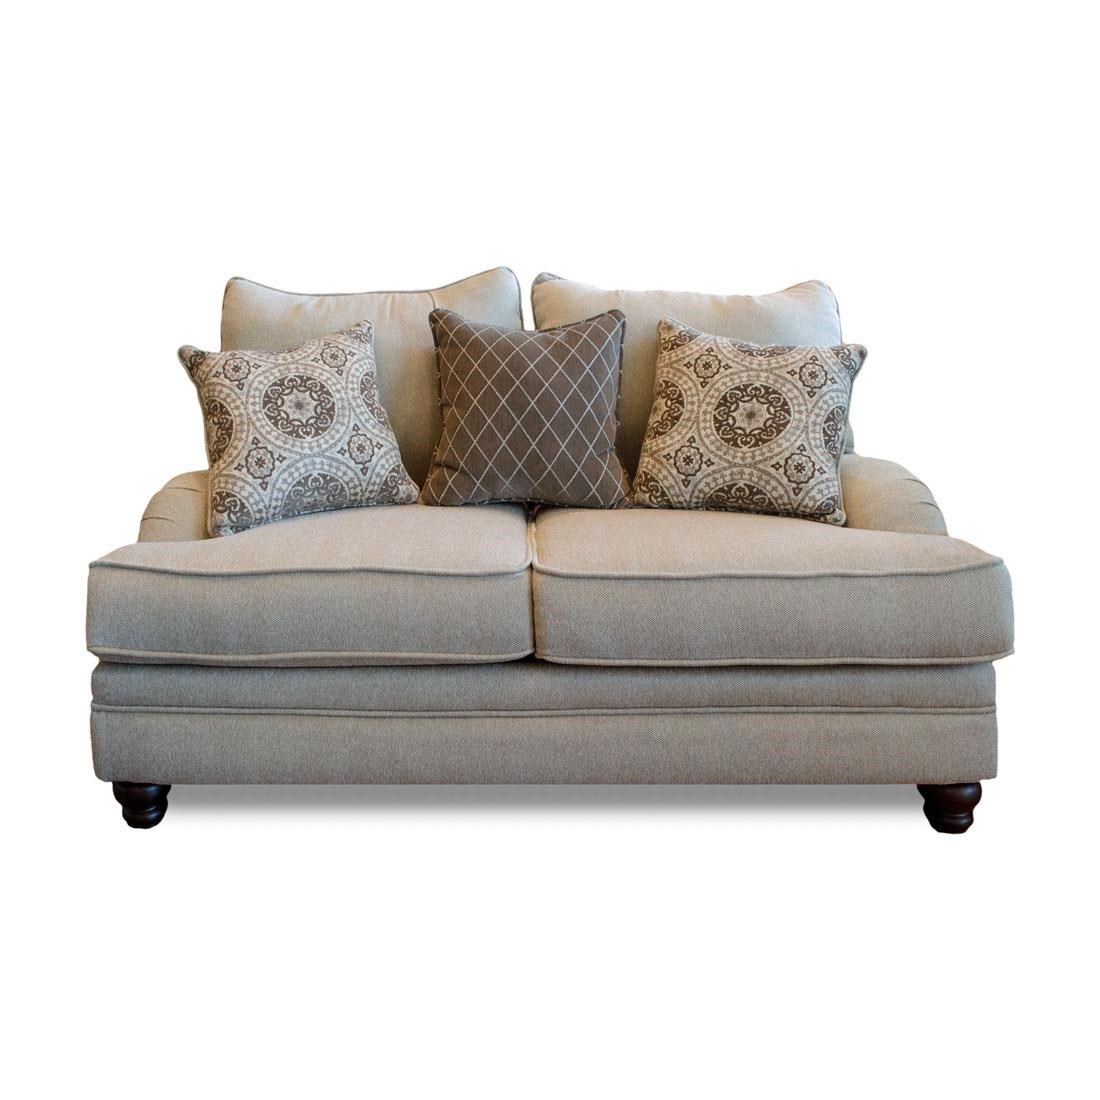 corinthian sofas rubber sofa feet reviews on at elgin